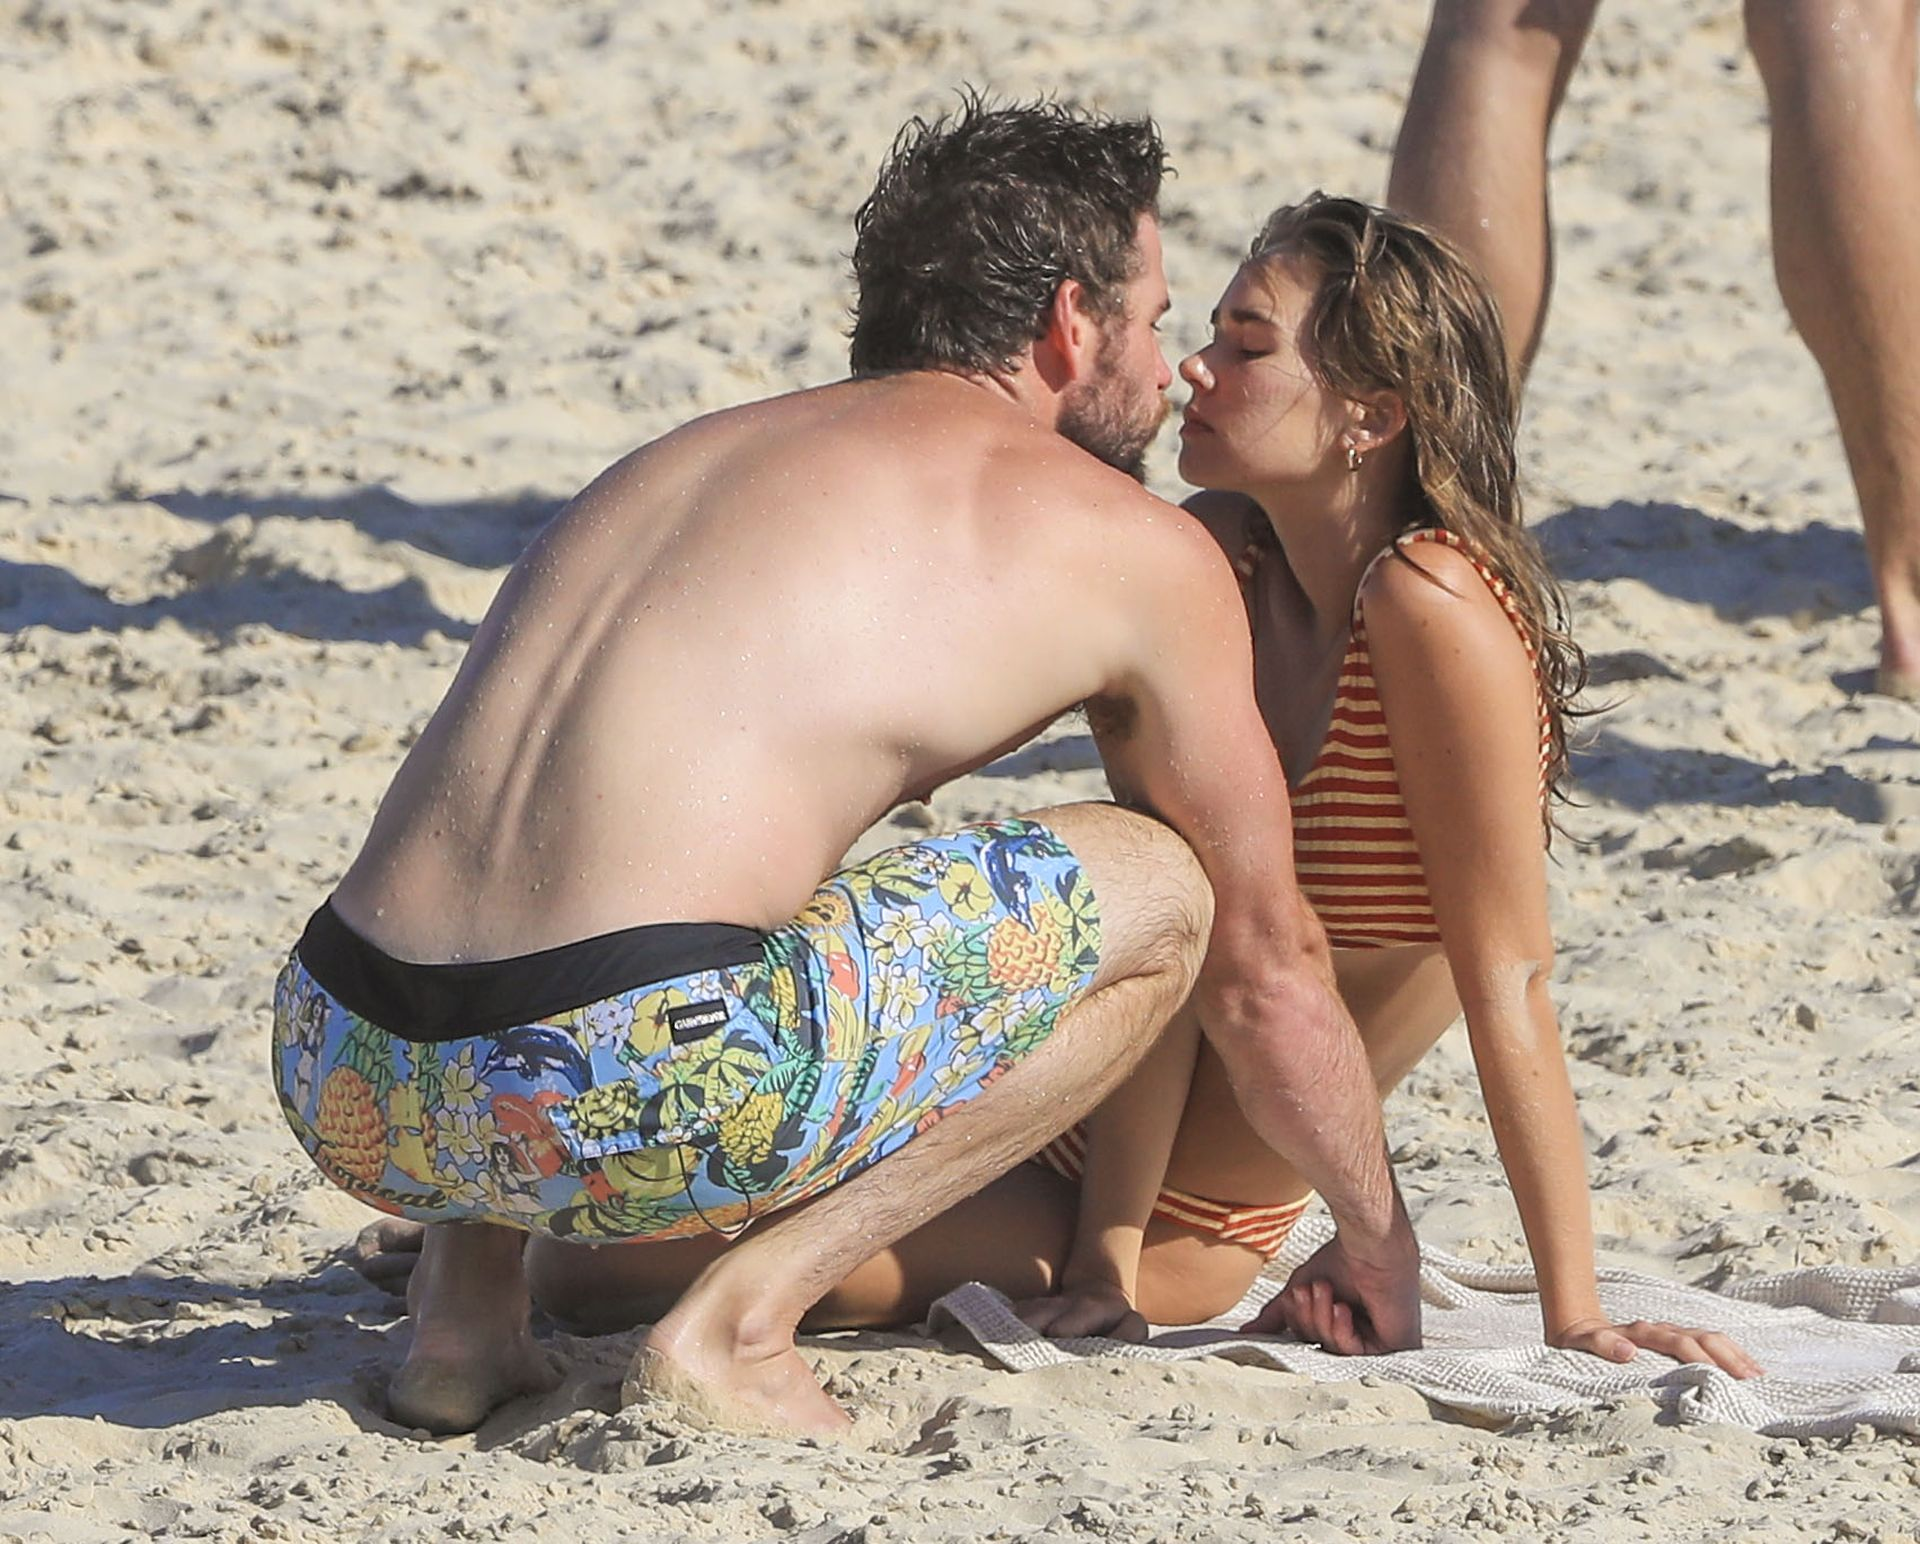 Gabriella Brooks Hot – Liam Hemsworth's New Girlfriend 0008